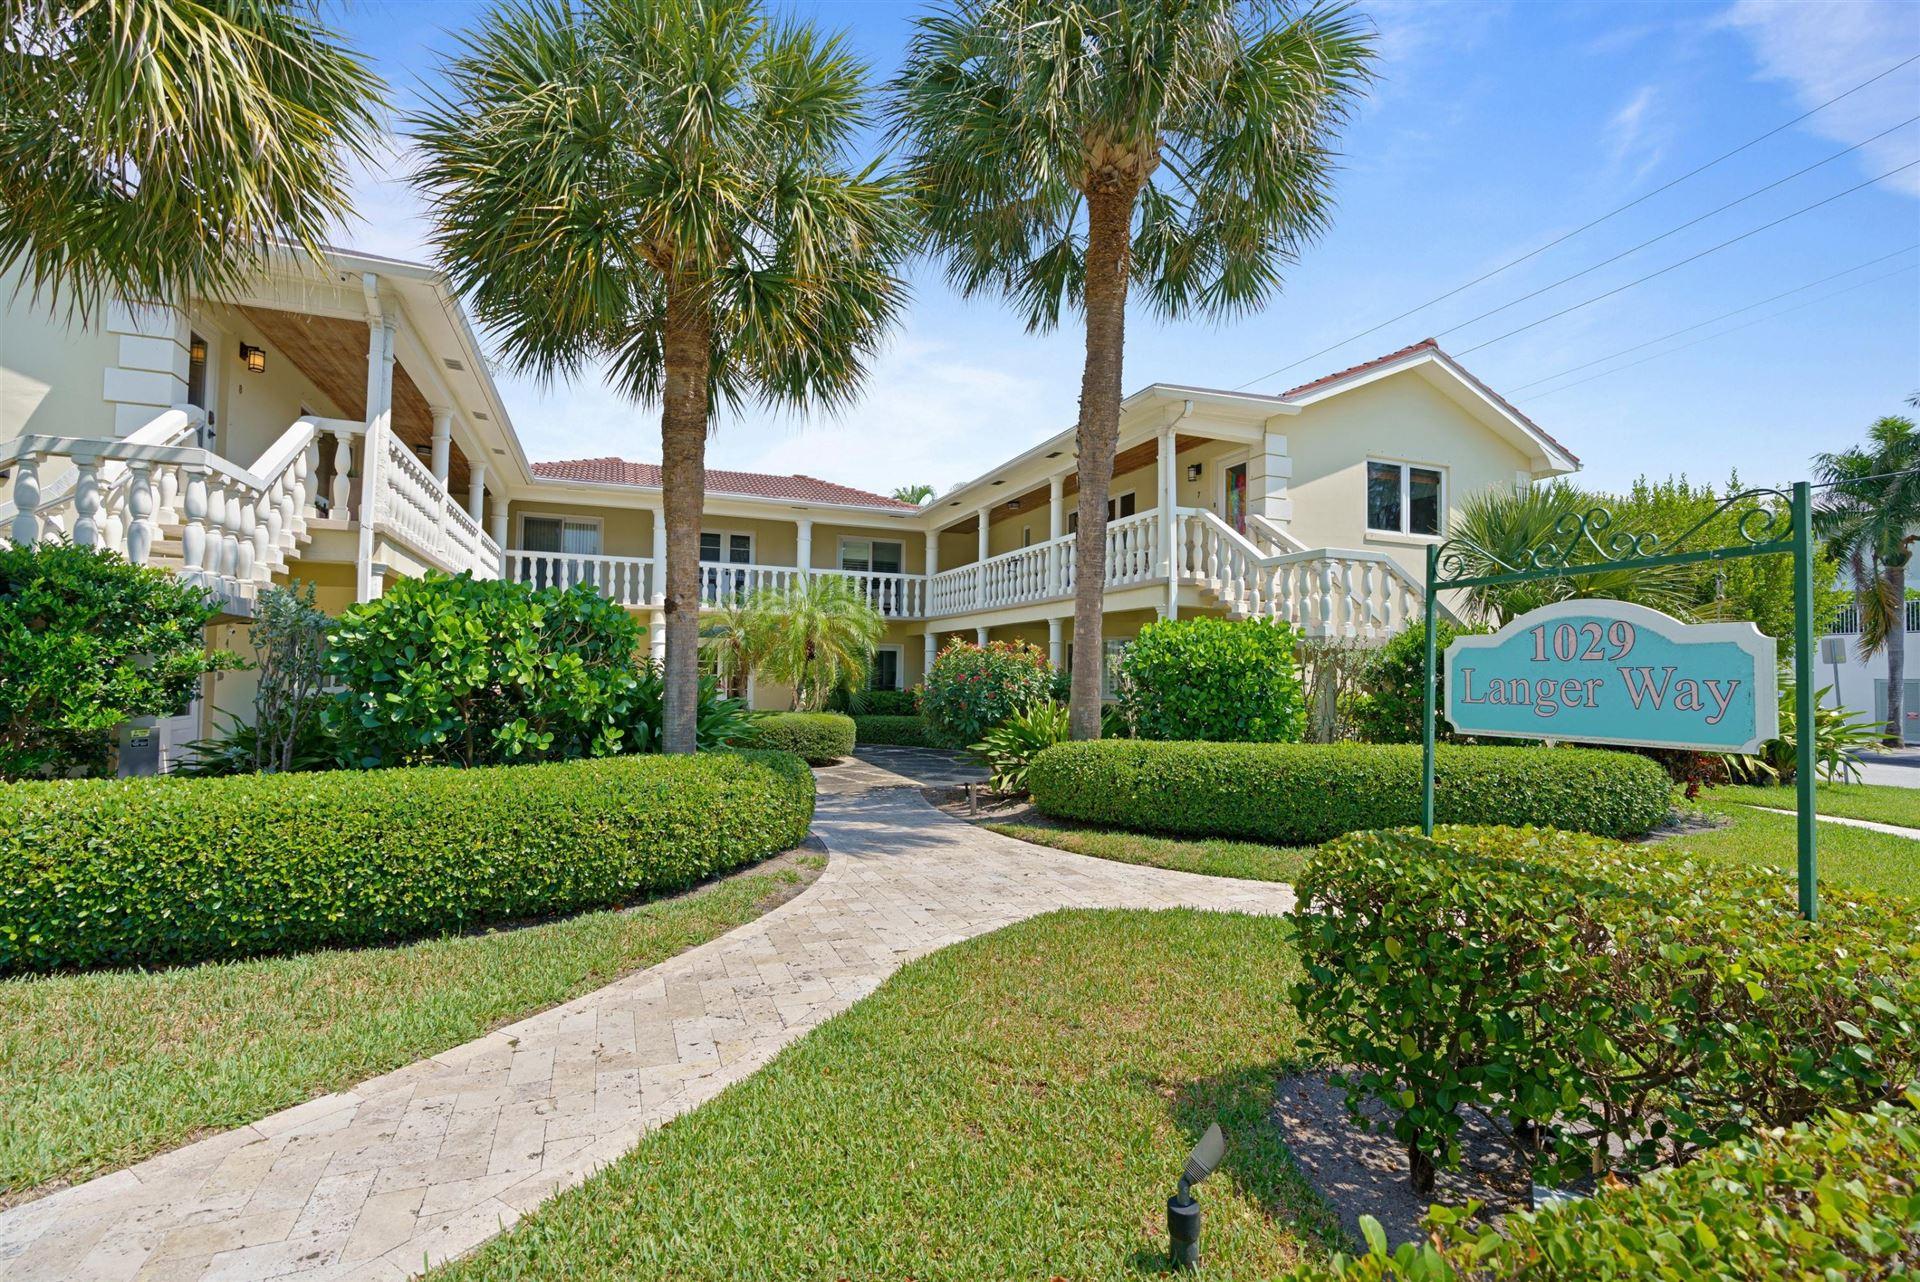 1029 Langer Way #2, Delray Beach, FL 33483 - #: RX-10708602